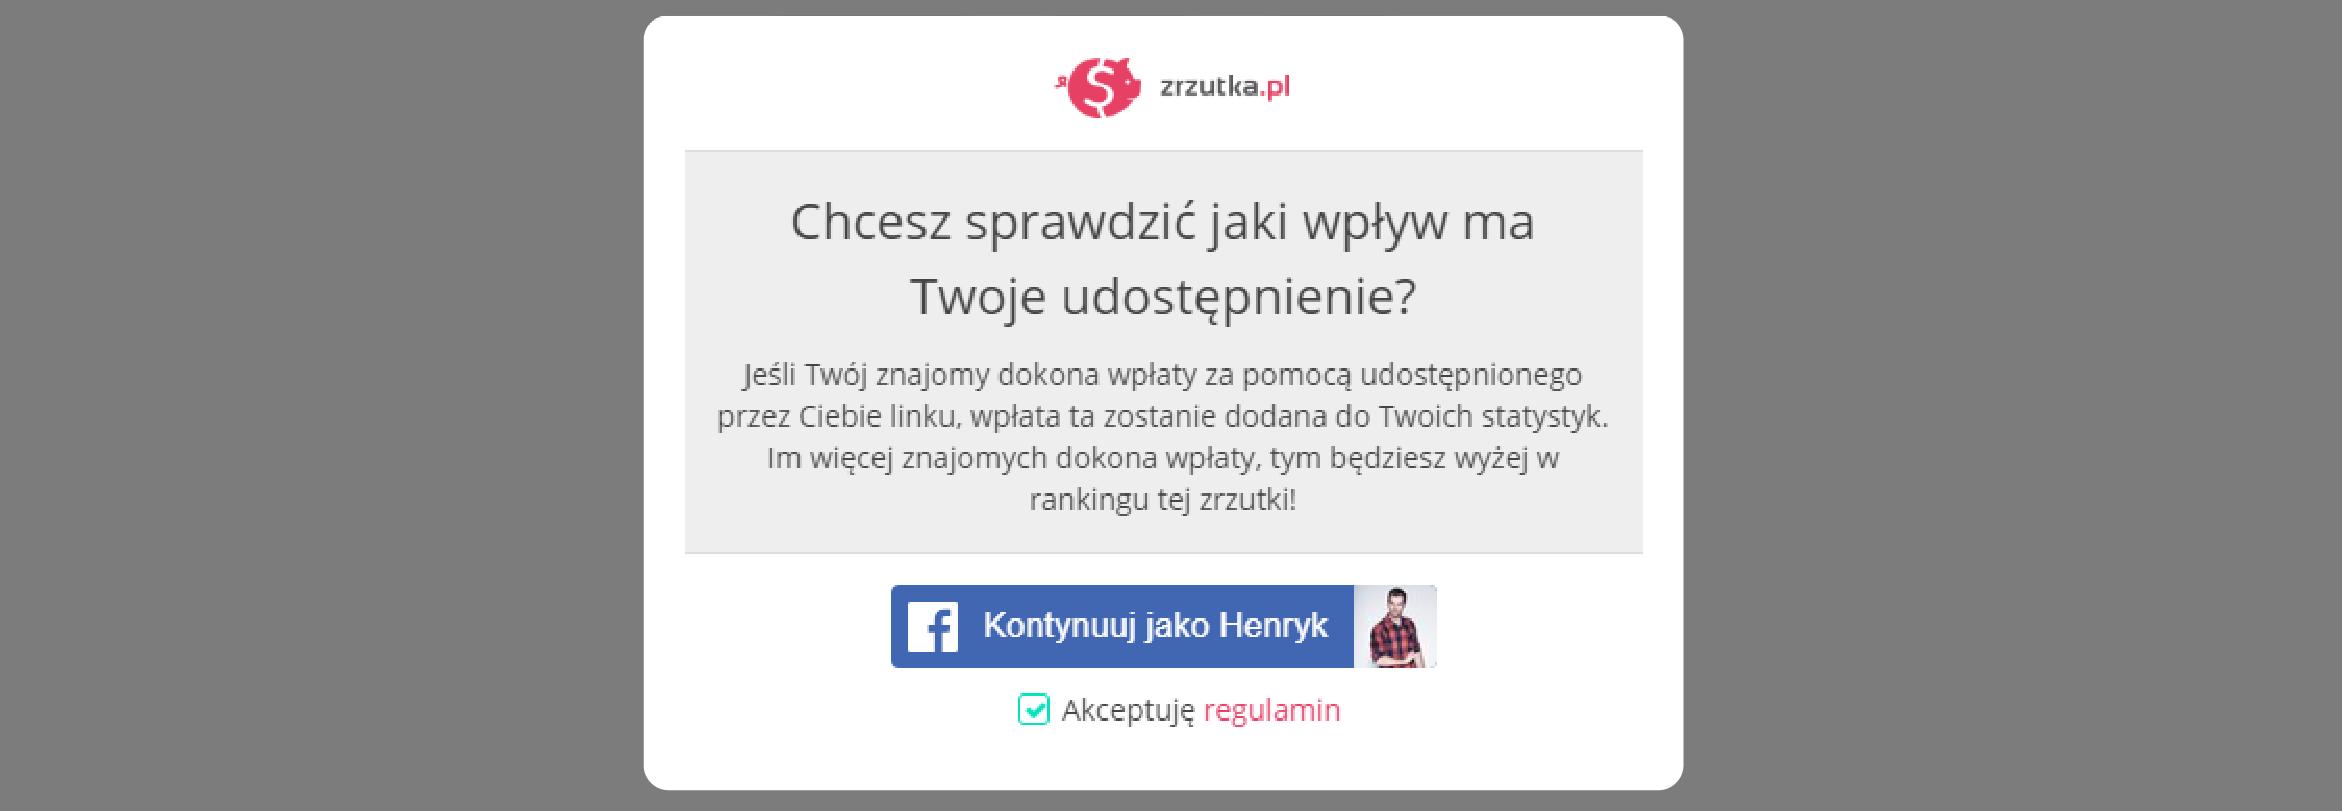 share_zrzutka